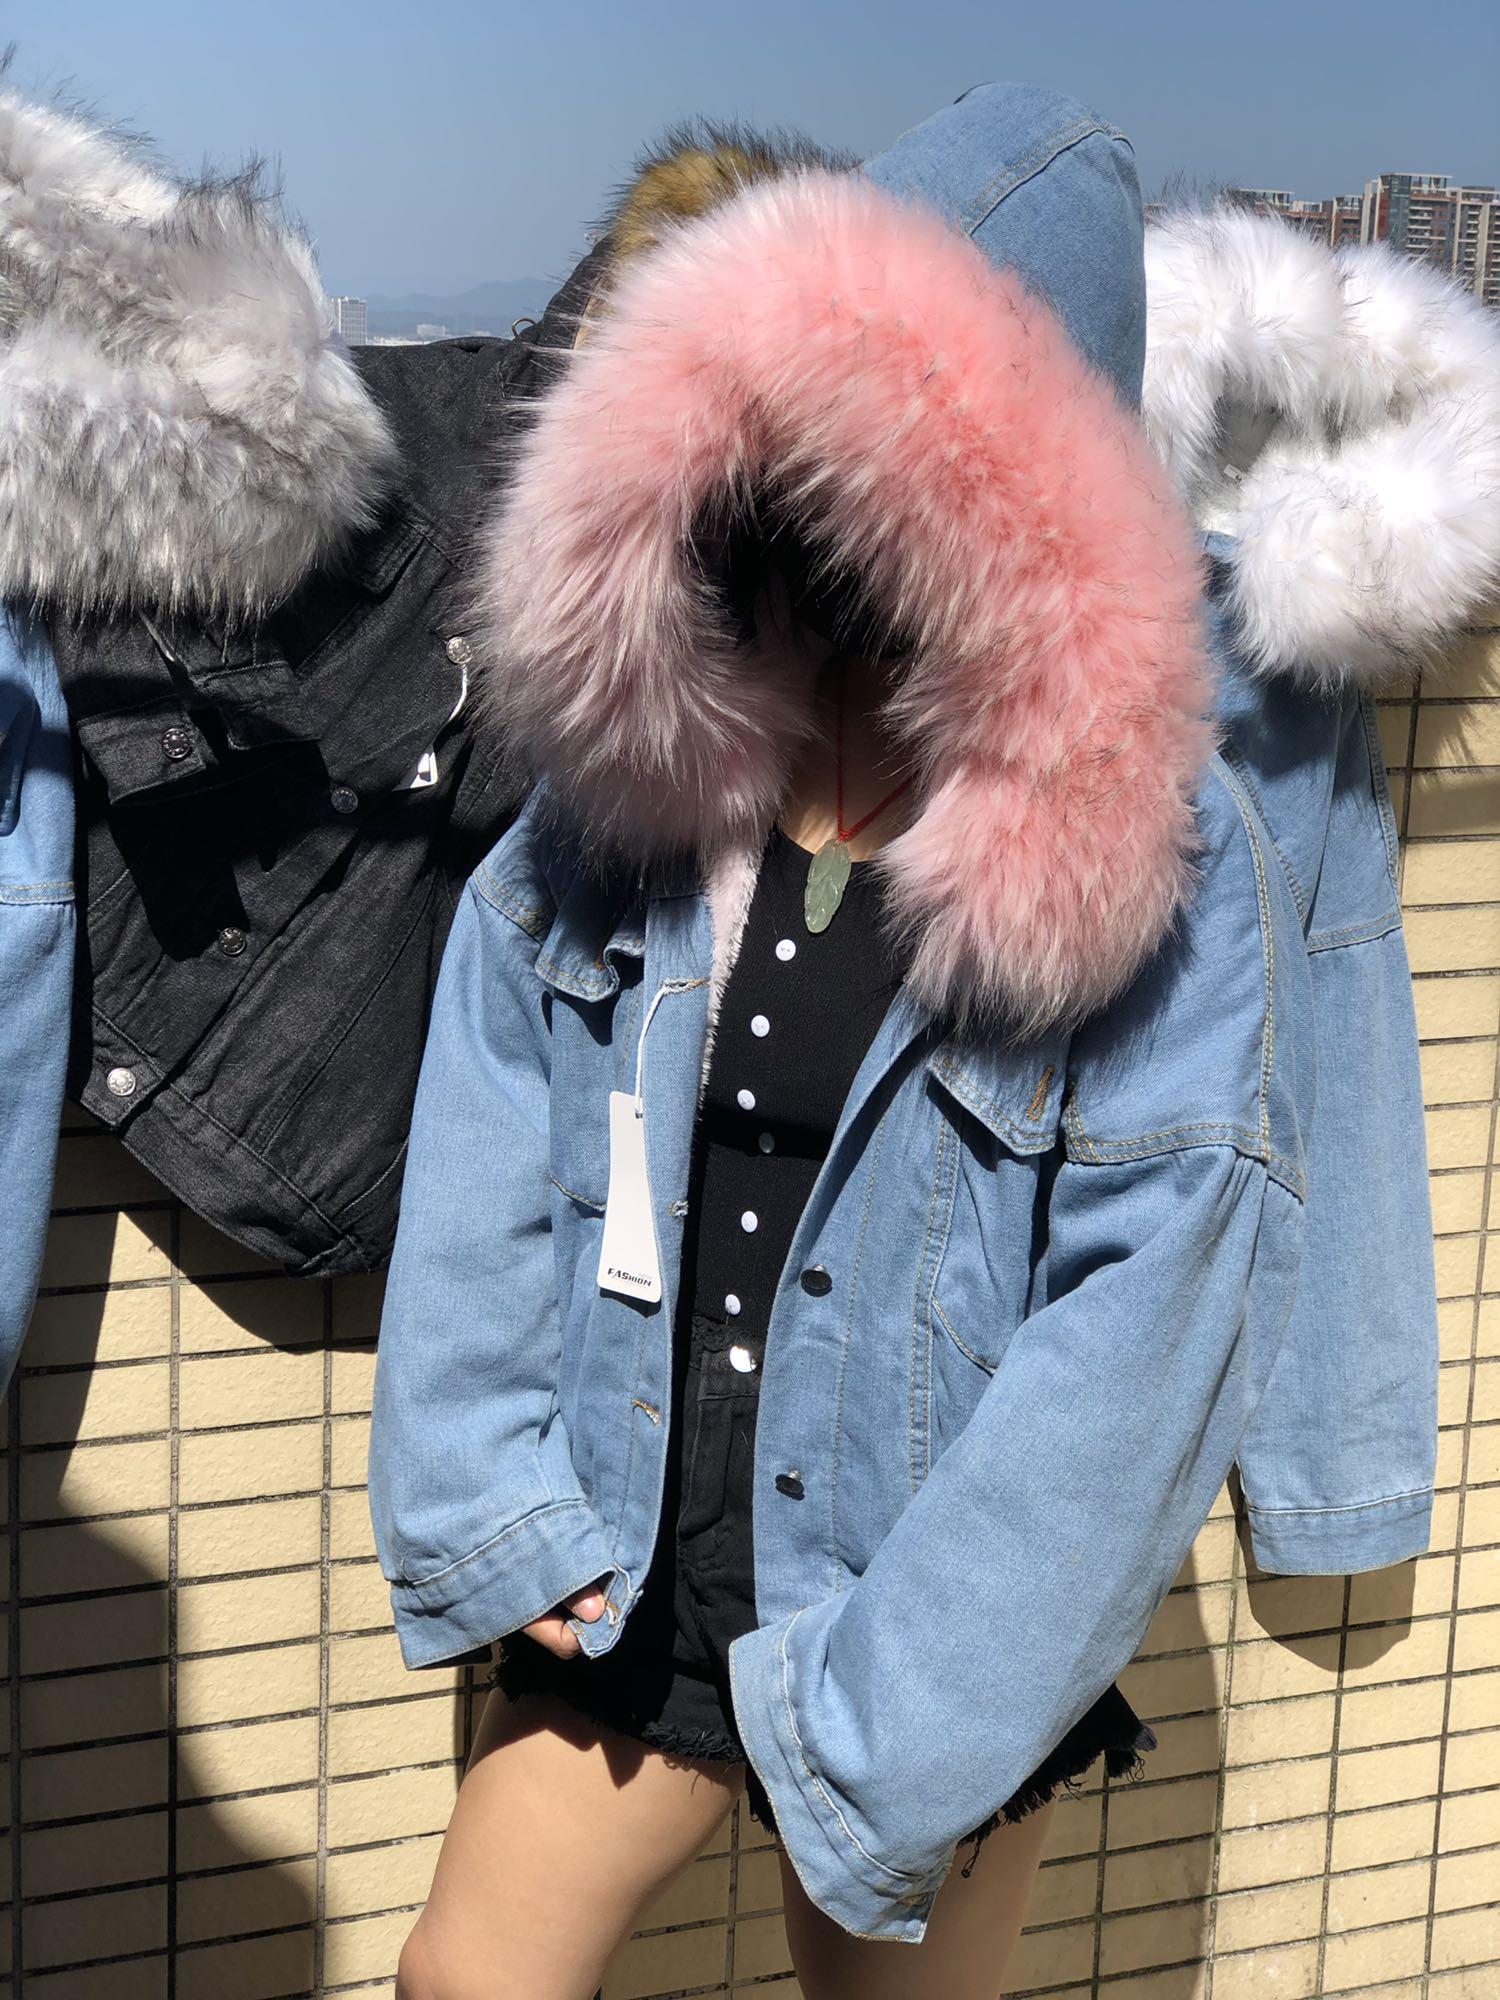 Hfc0447901b4941058ee358e25174e6429 LUZUZI 2019 New Warm Winter Bomber Women Winter Autumn Hooded Girls Coat Jeans Denim Jackets Basic Ladies Top Windbreaker Female